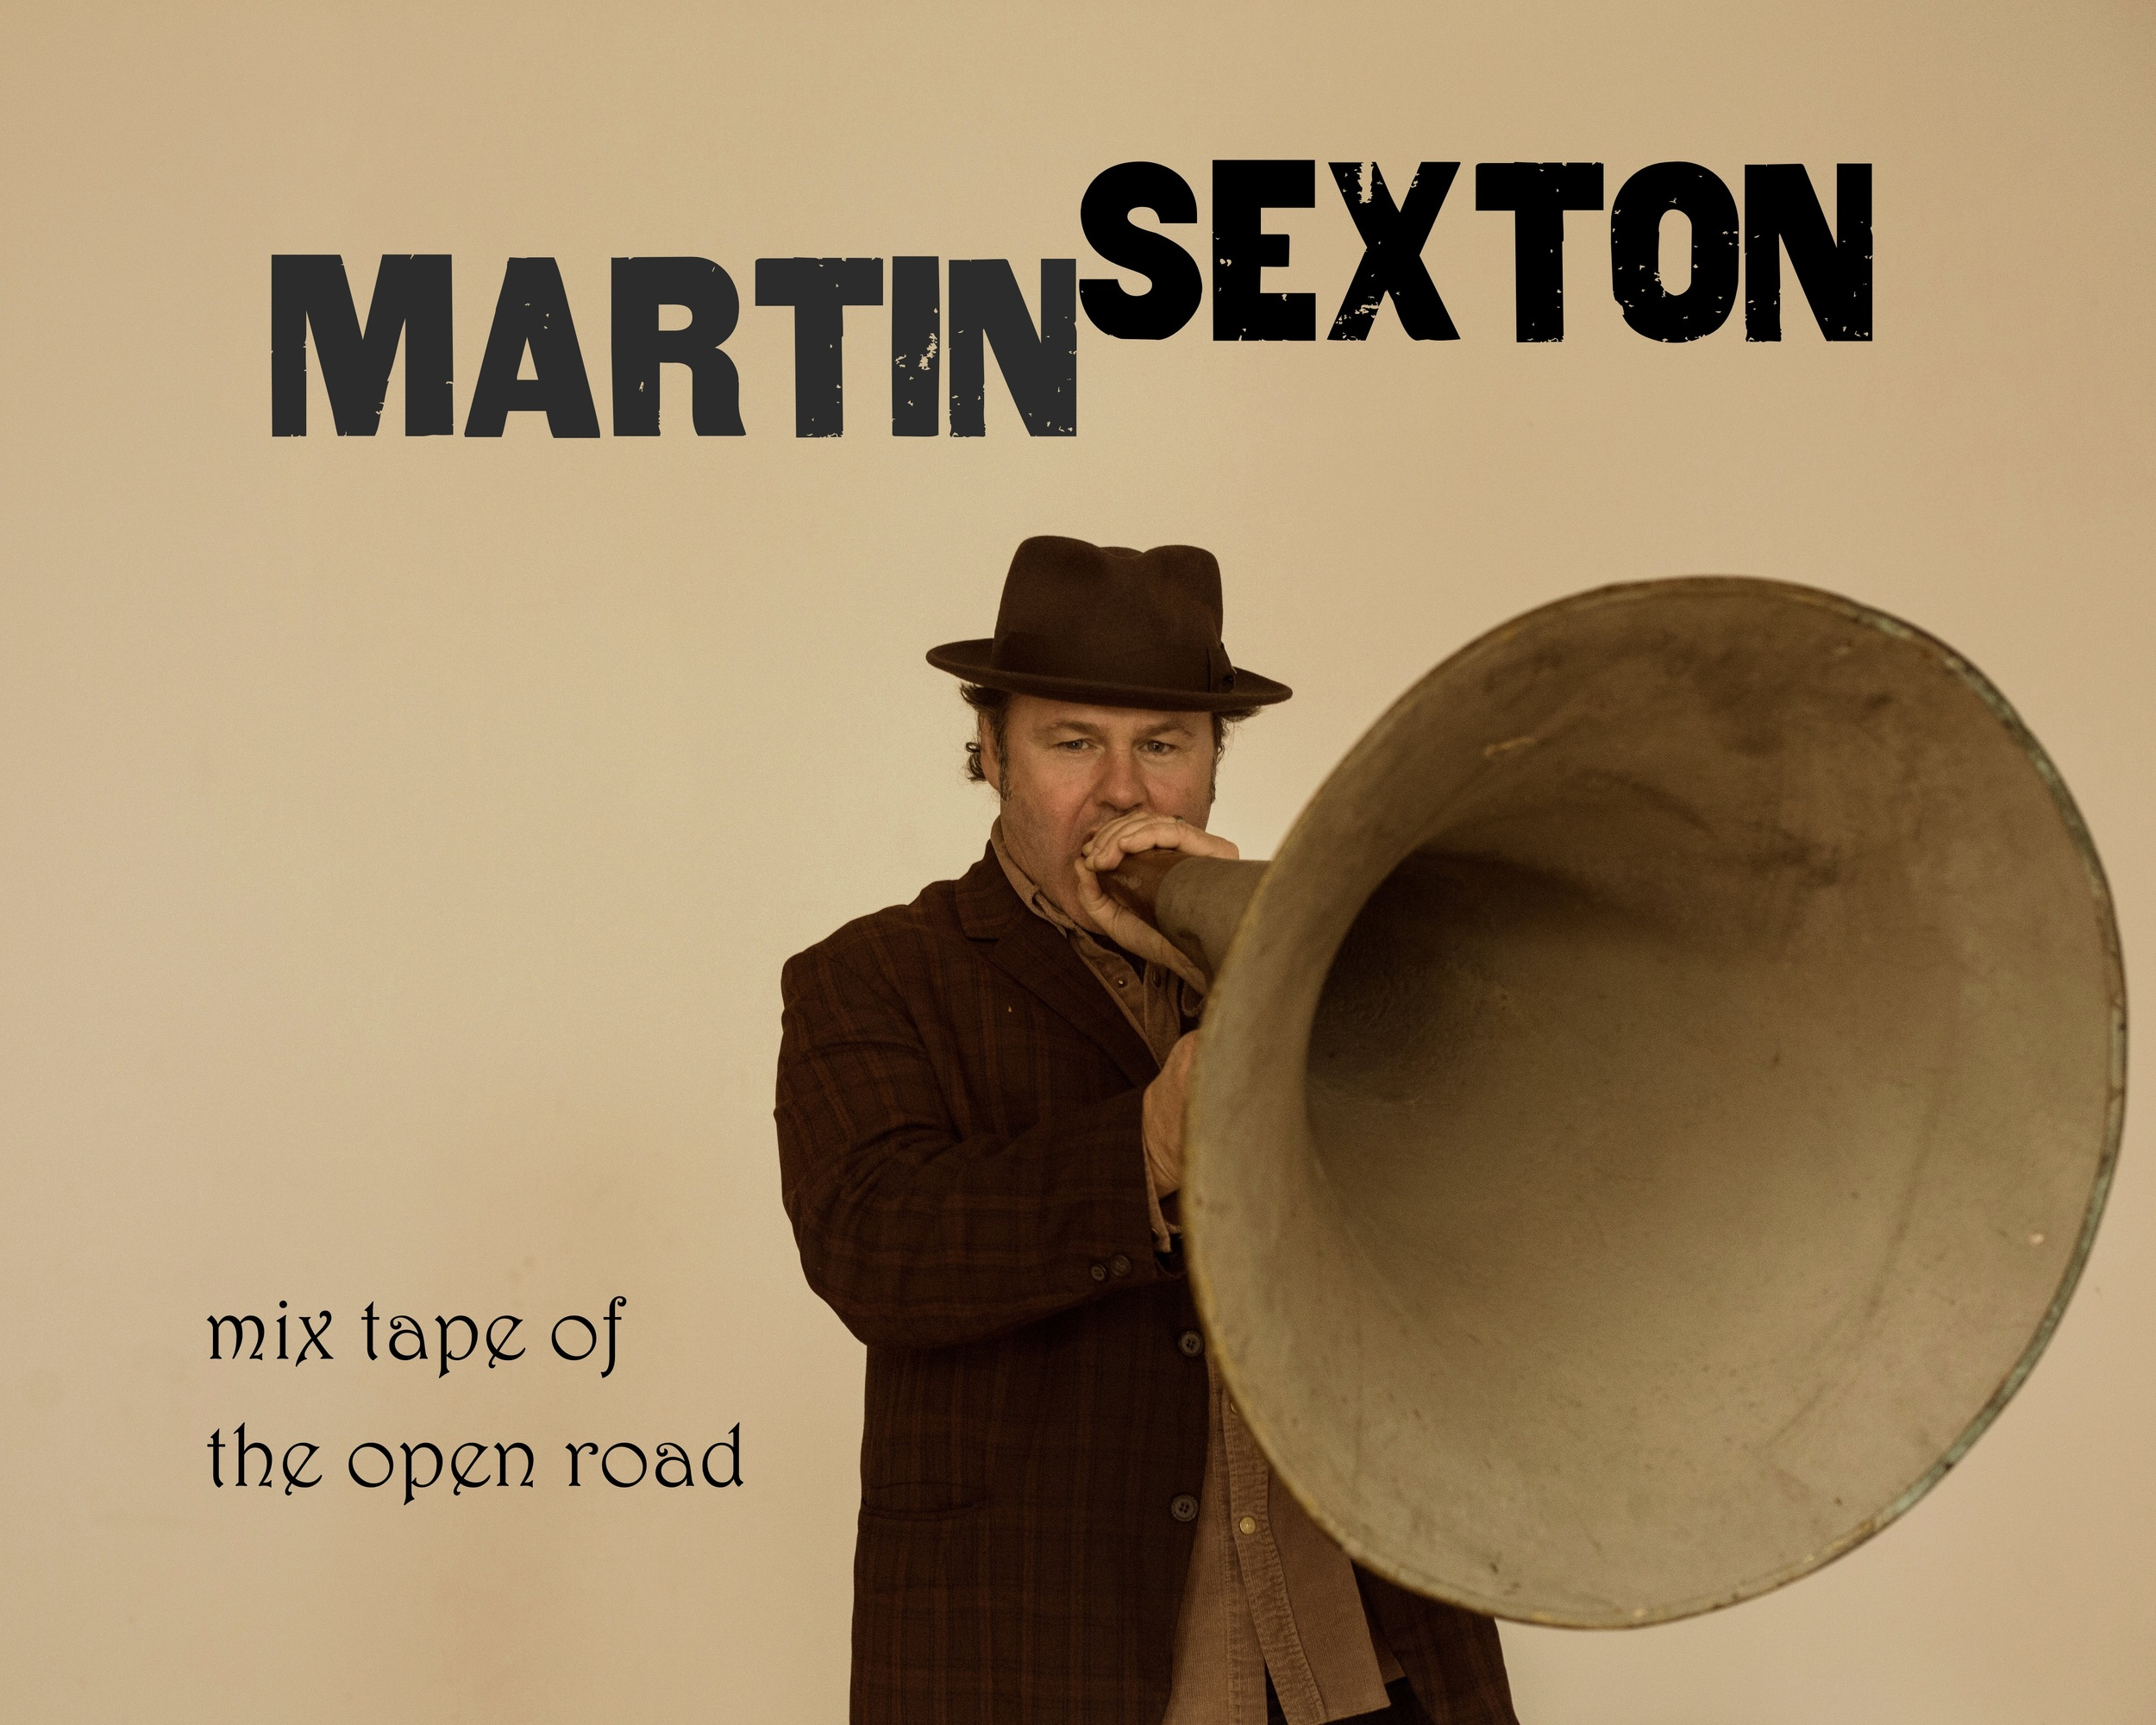 martinsexton.bullhorn.frontal.jpg